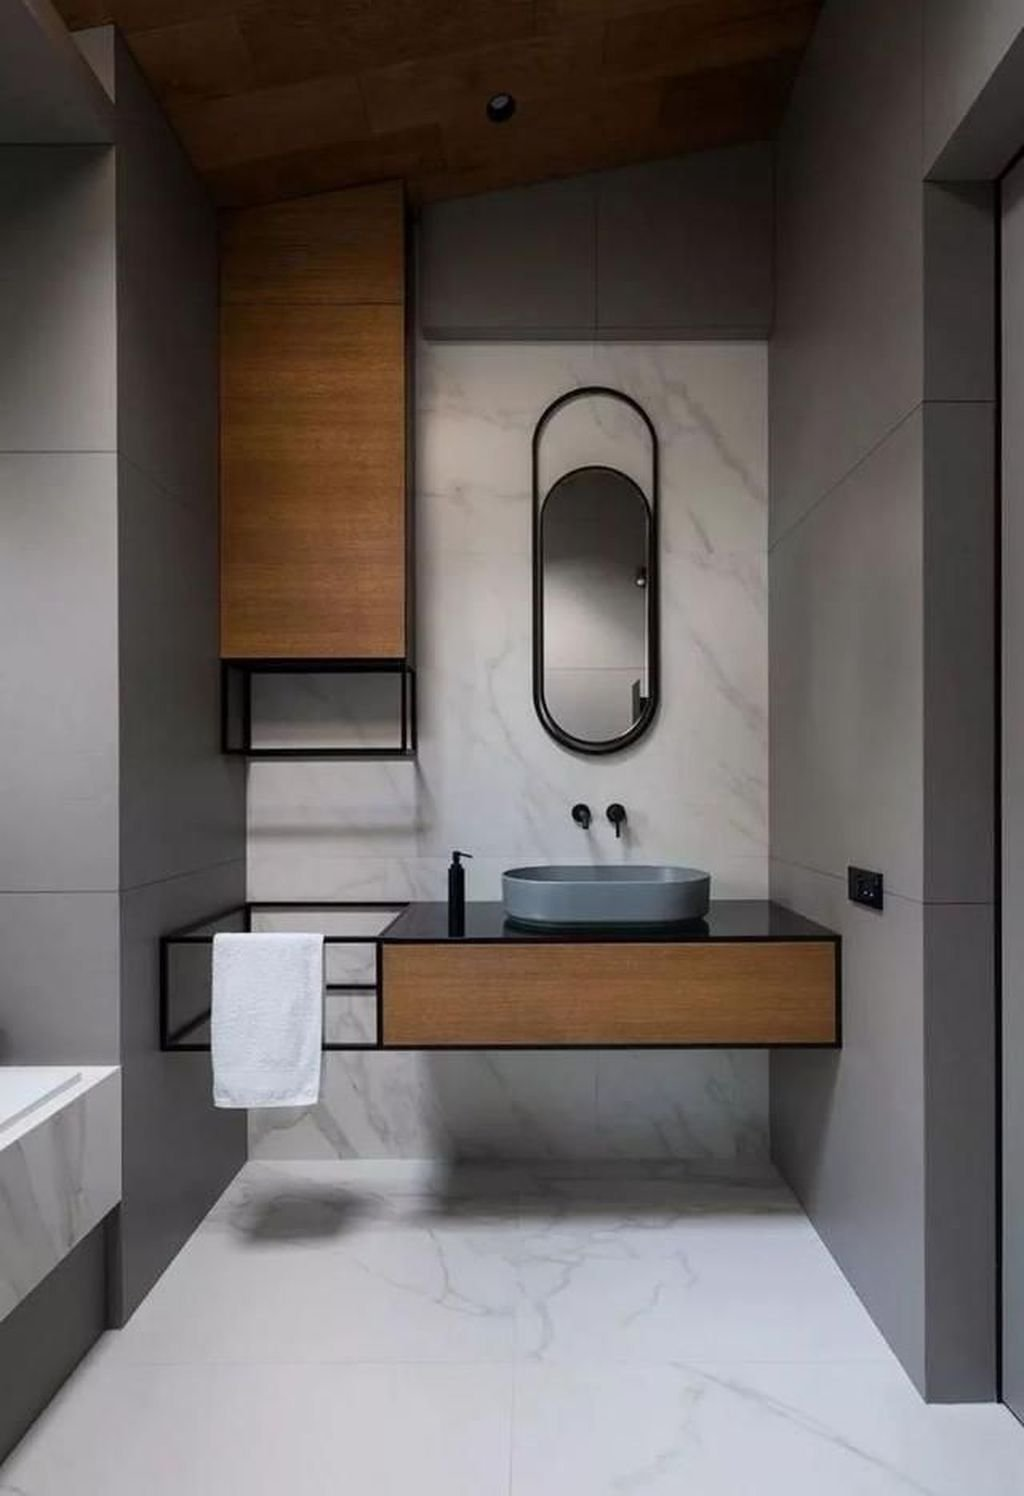 Fabulous Minimalist Bathroom Decor Ideas That Become Everyones Dream 01